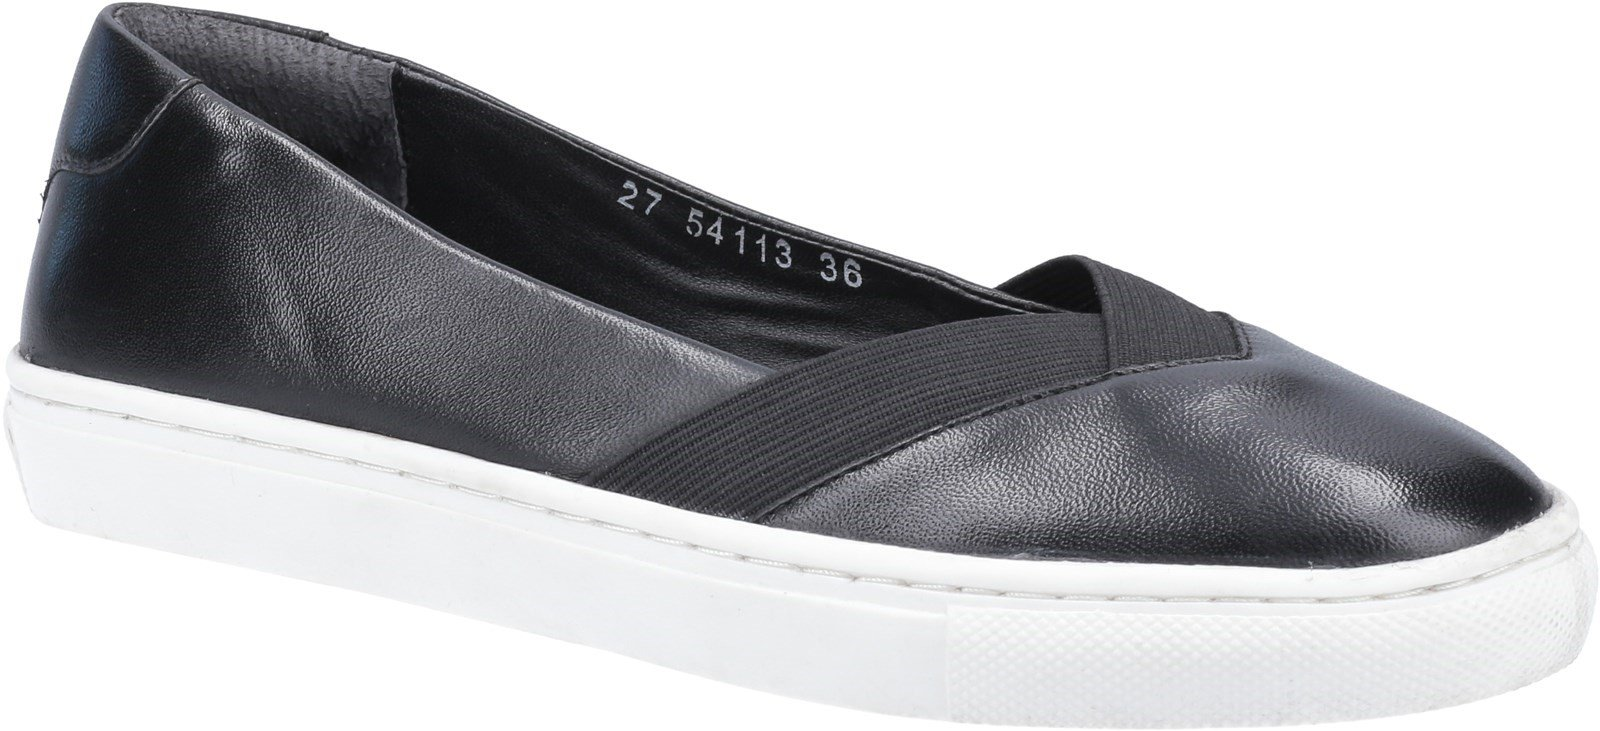 Hush Puppies Women's Tiffany Slip On Flat Shoe Various Colours 31962 - Black 5